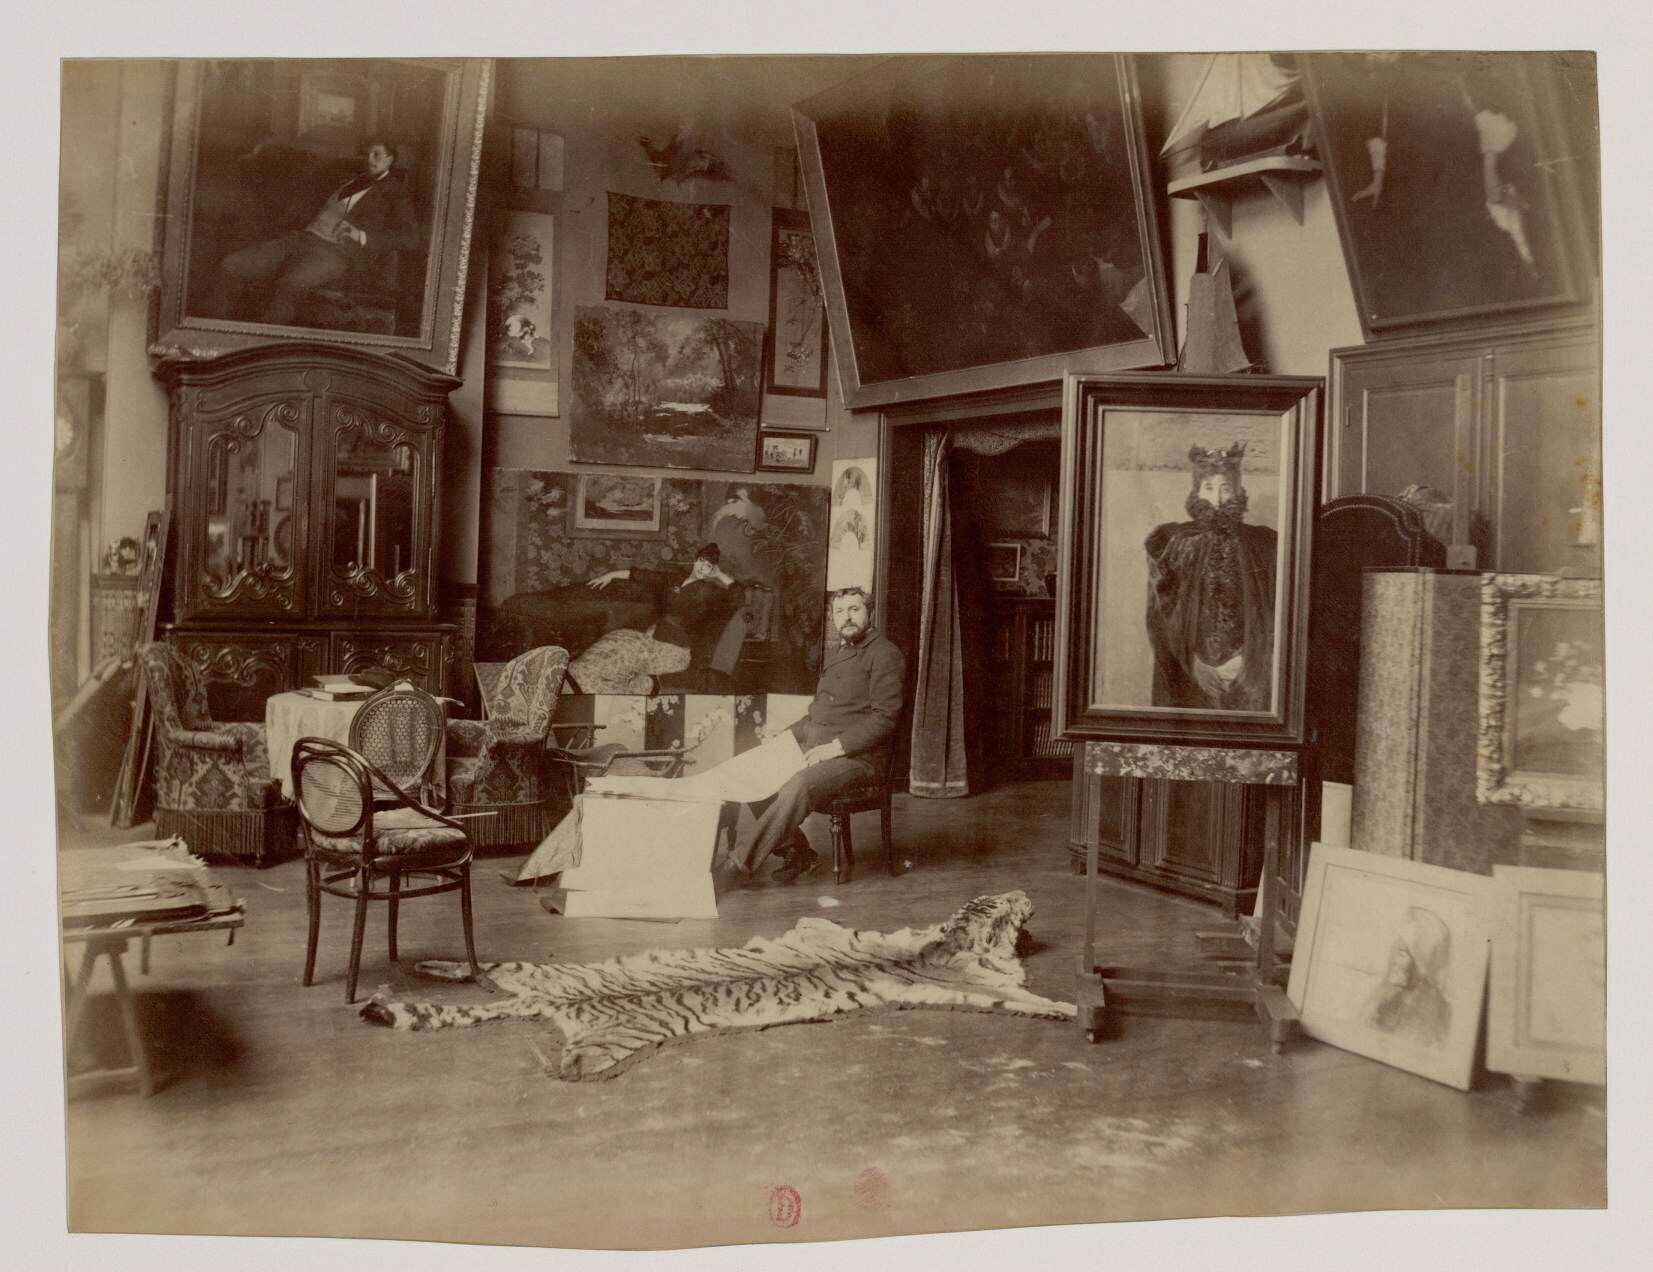 Эрнст Анж Дуез (1843-1896) - французский живописец